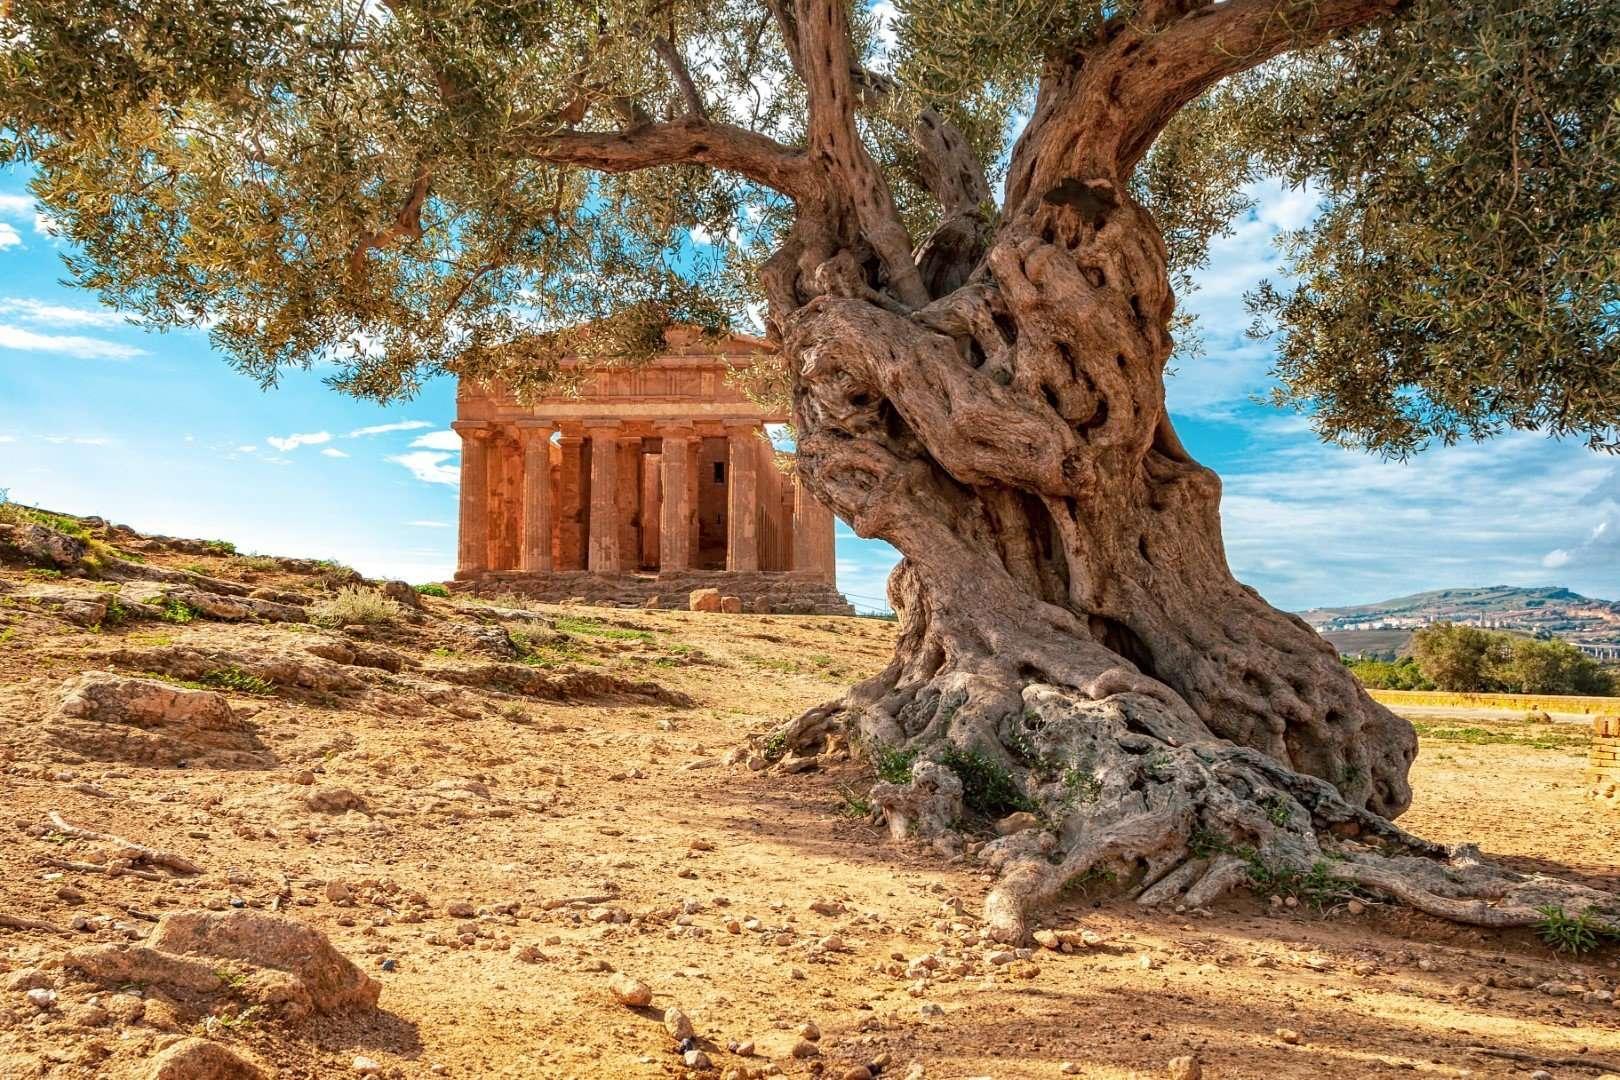 agrigento - tempelvallei met grote olijfboom